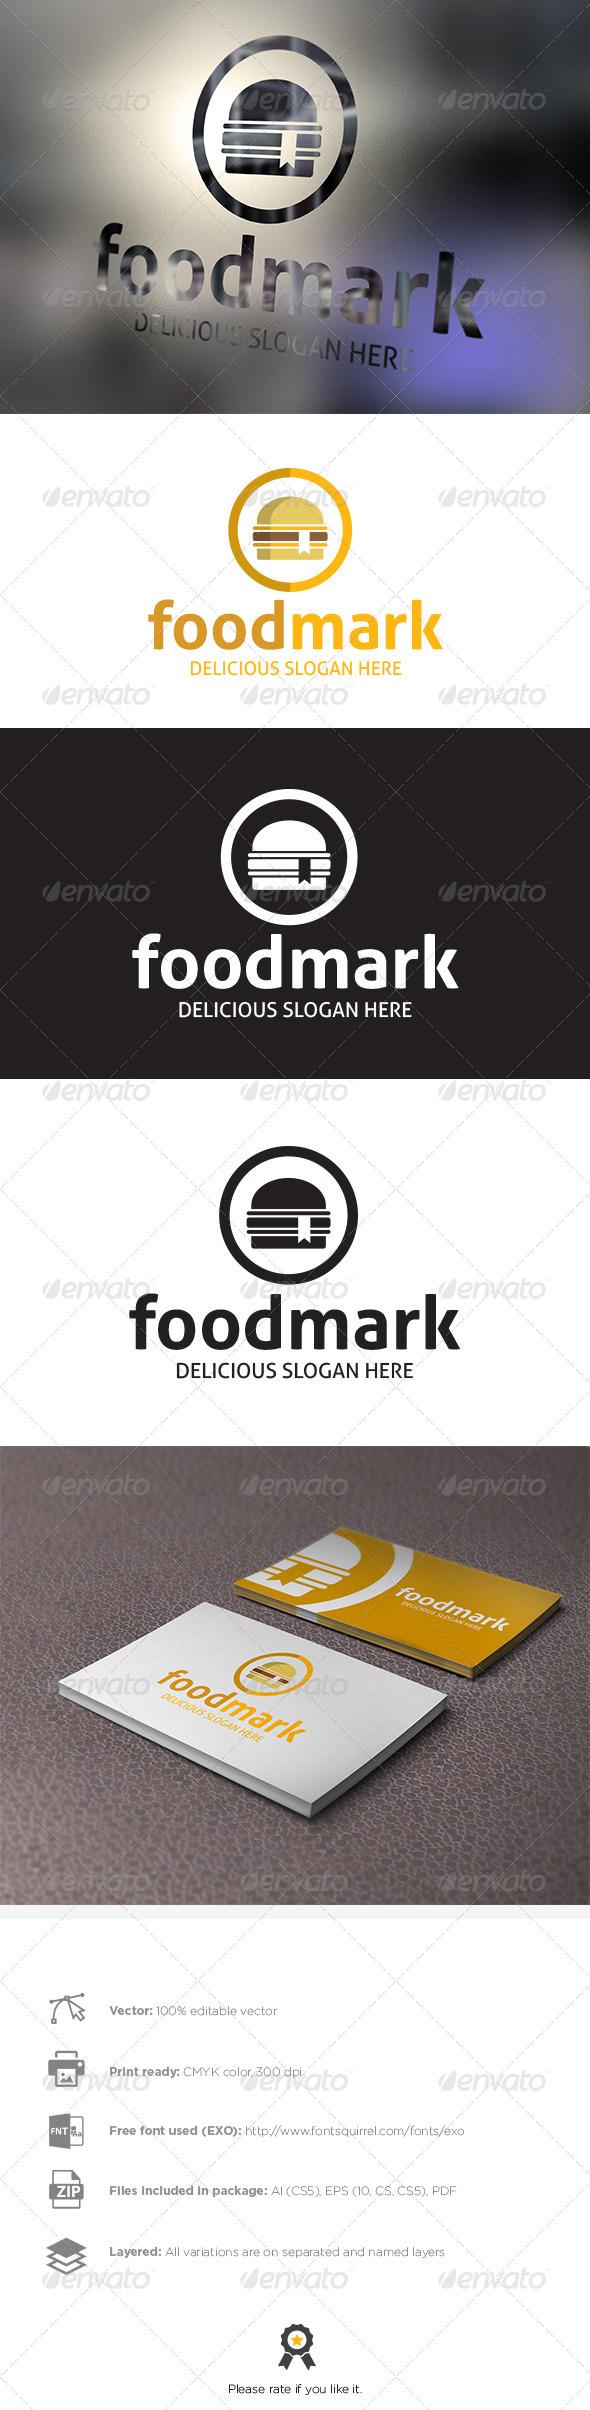 GraphicRiver Foodmark Logo Template 8002041